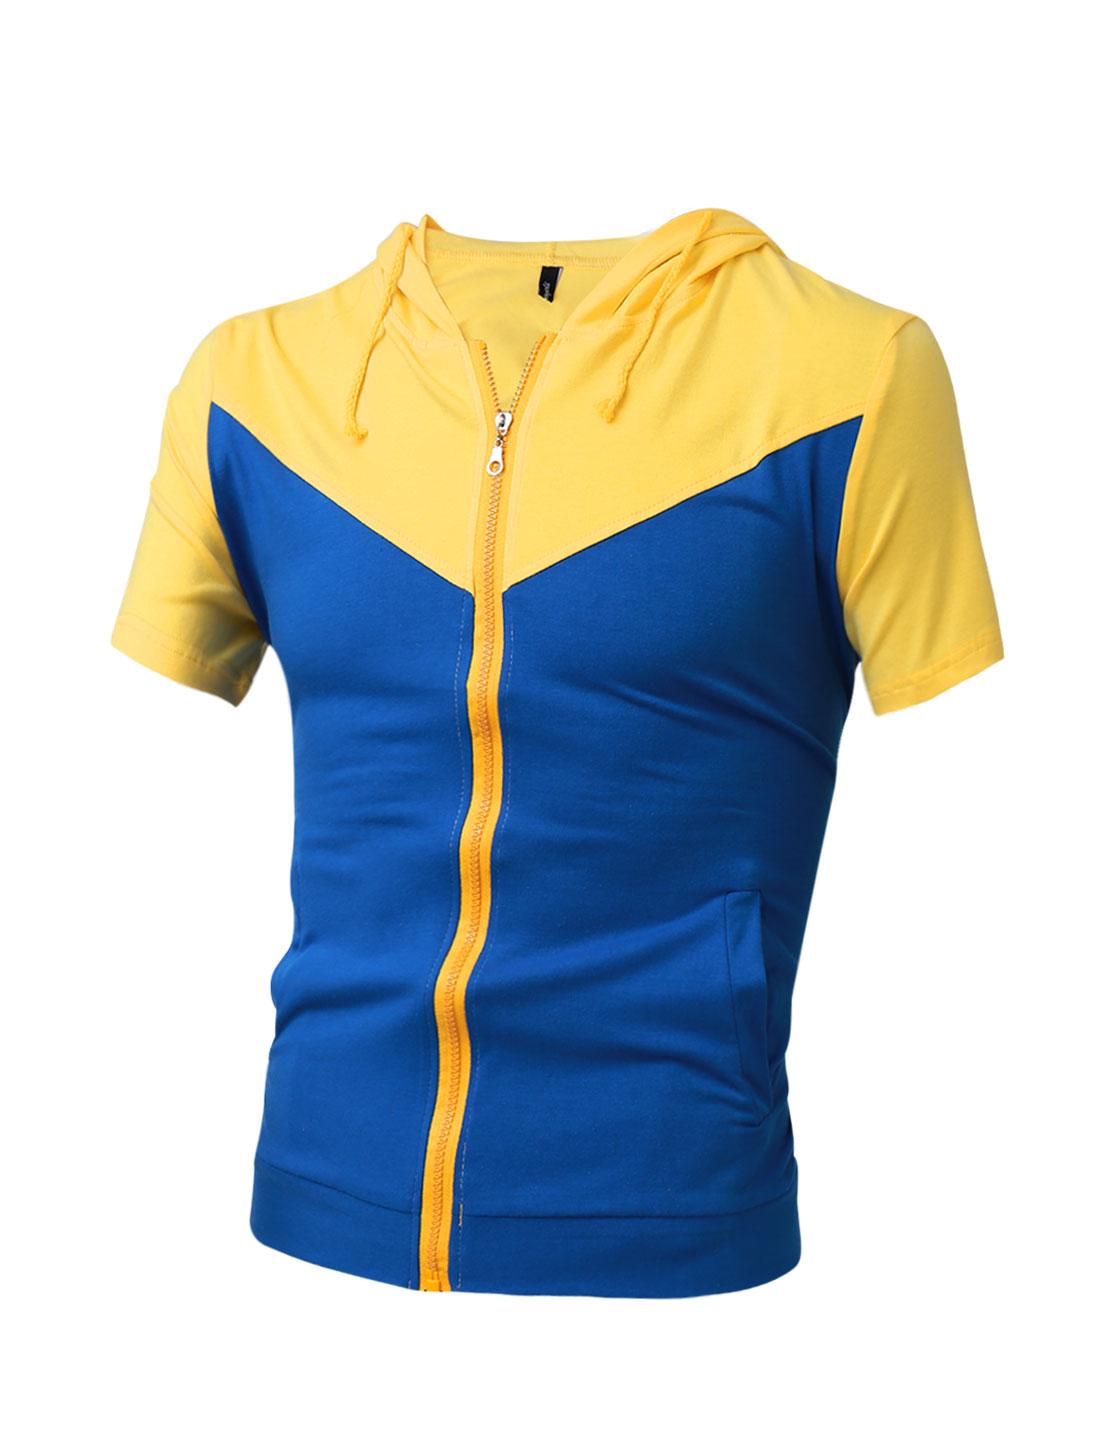 Men Yellow Blue Zipper Short Sleeve Slant Pocket Sweatshirt M